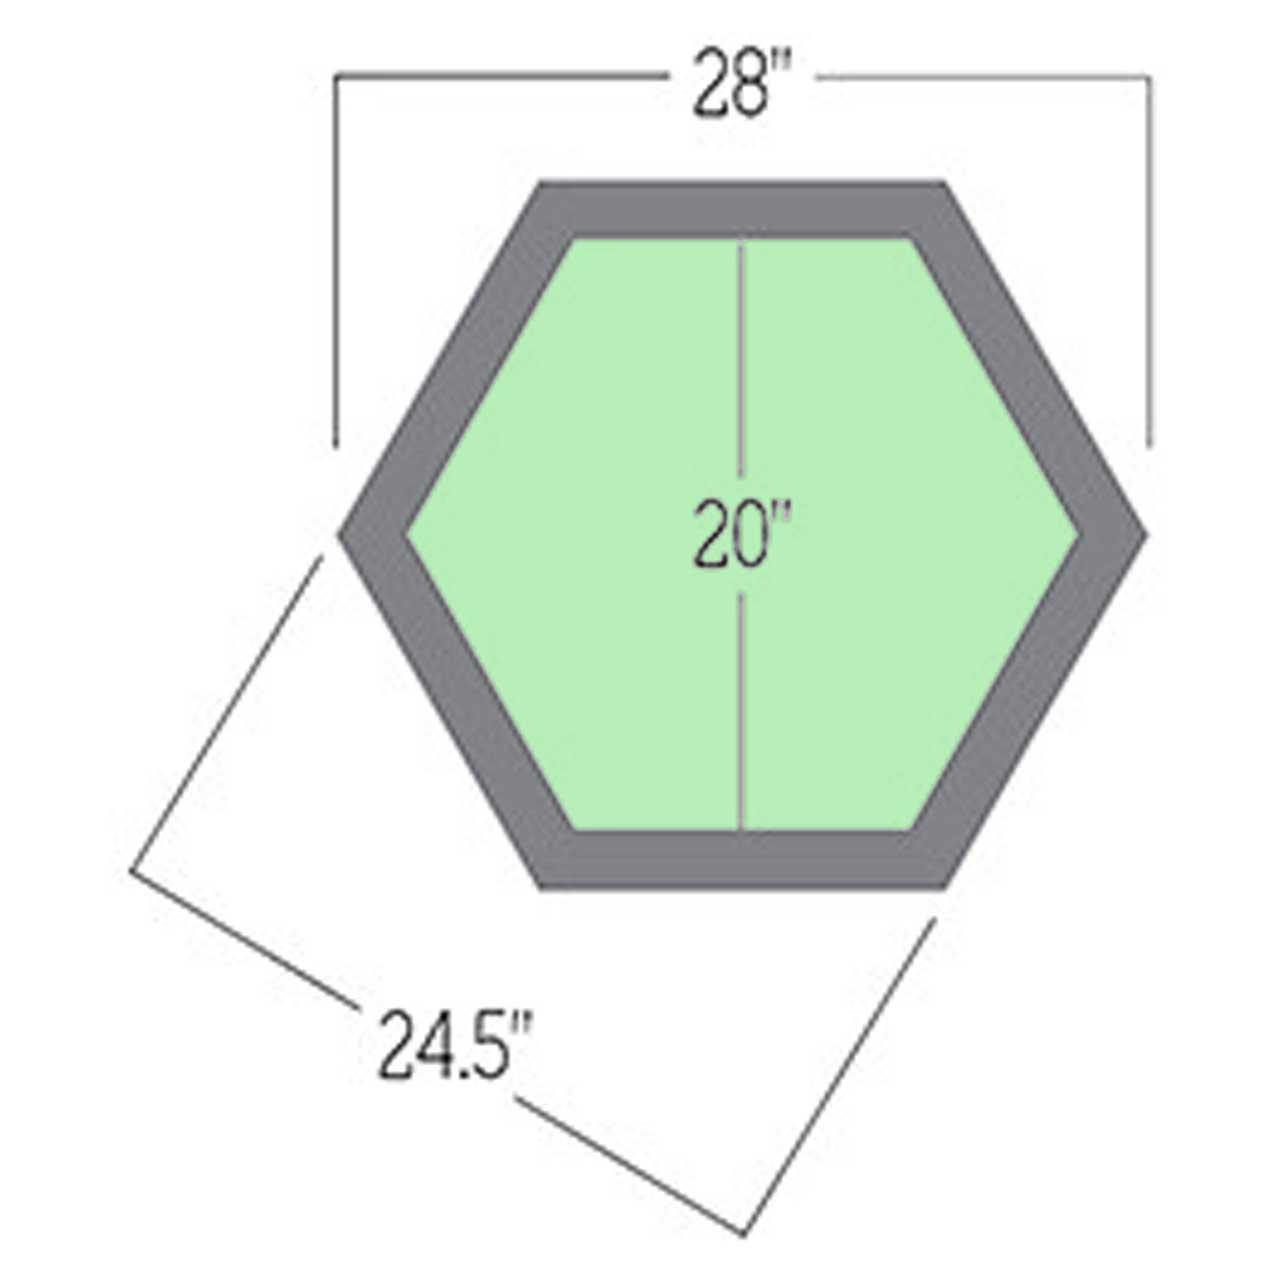 topaz-hex-size.jpg